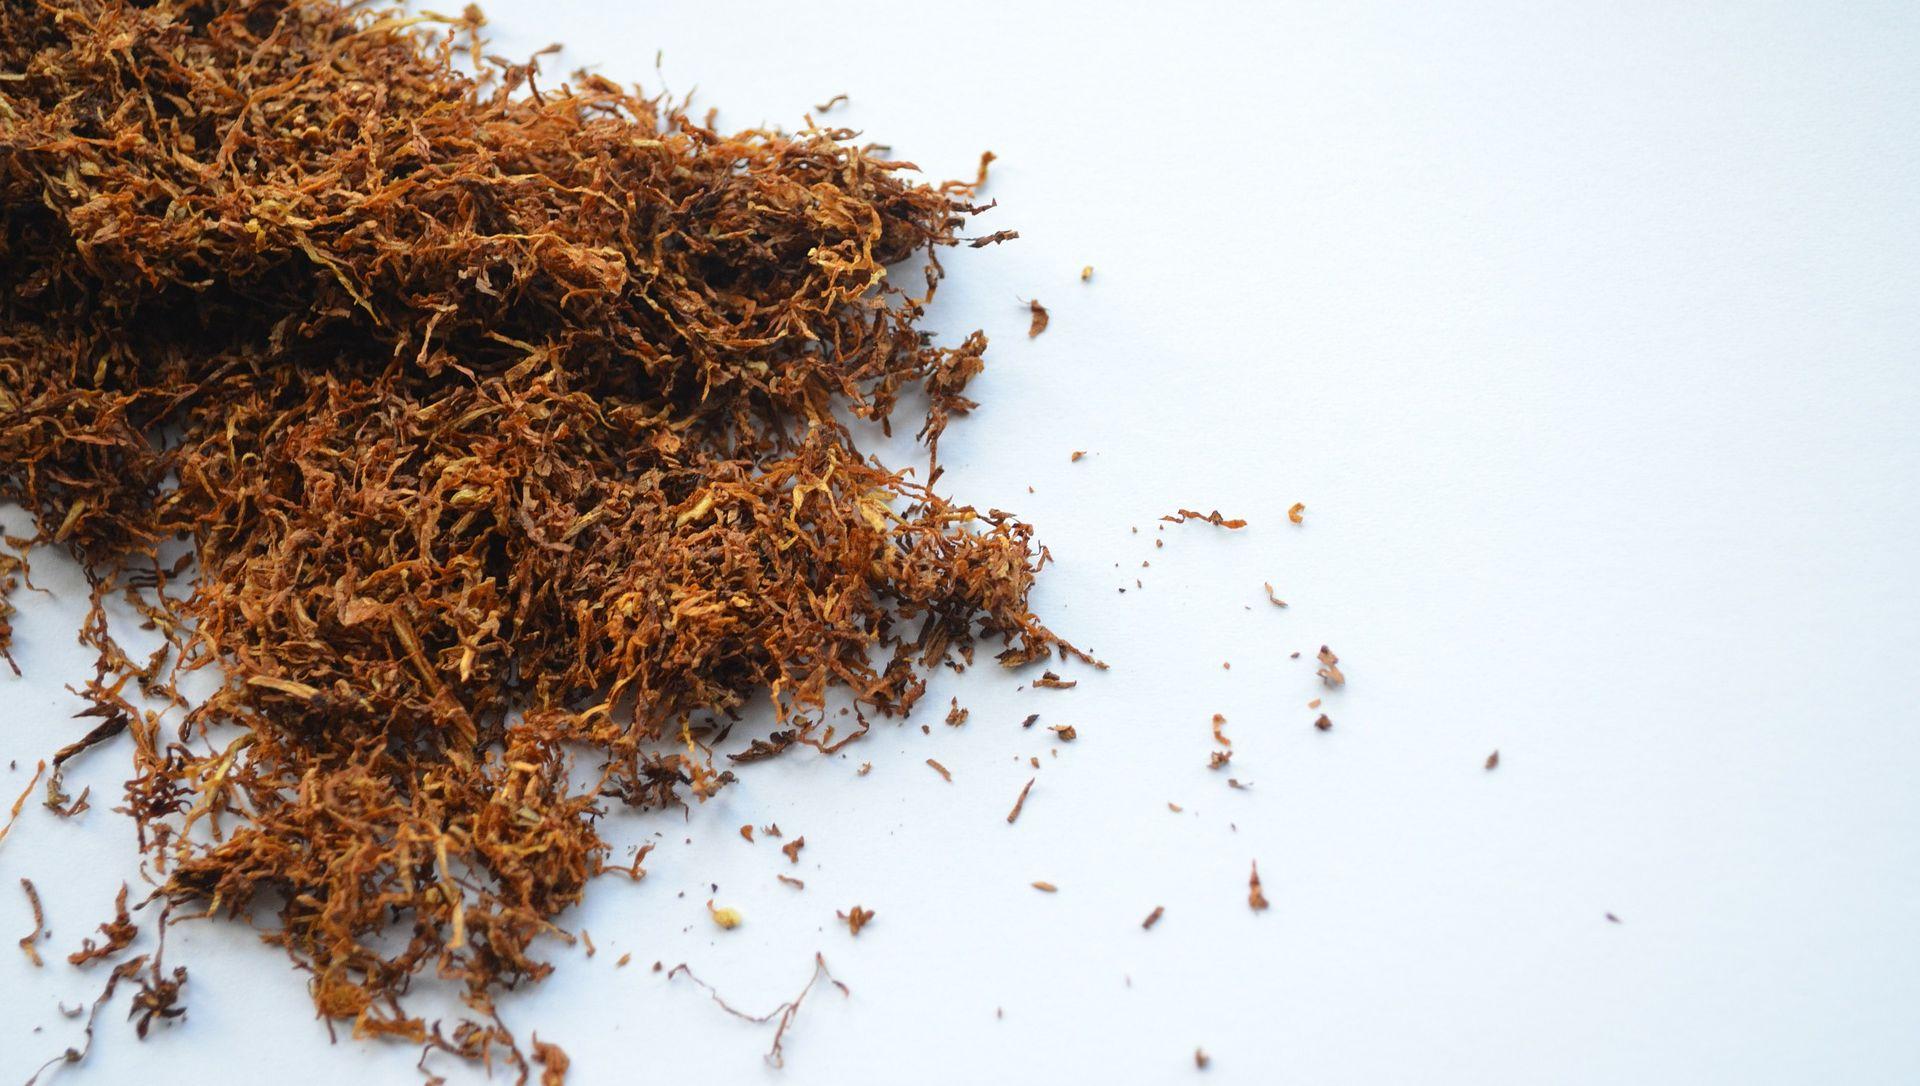 Zagrepčanin (45) 'pao' s više od 10 tona duhana